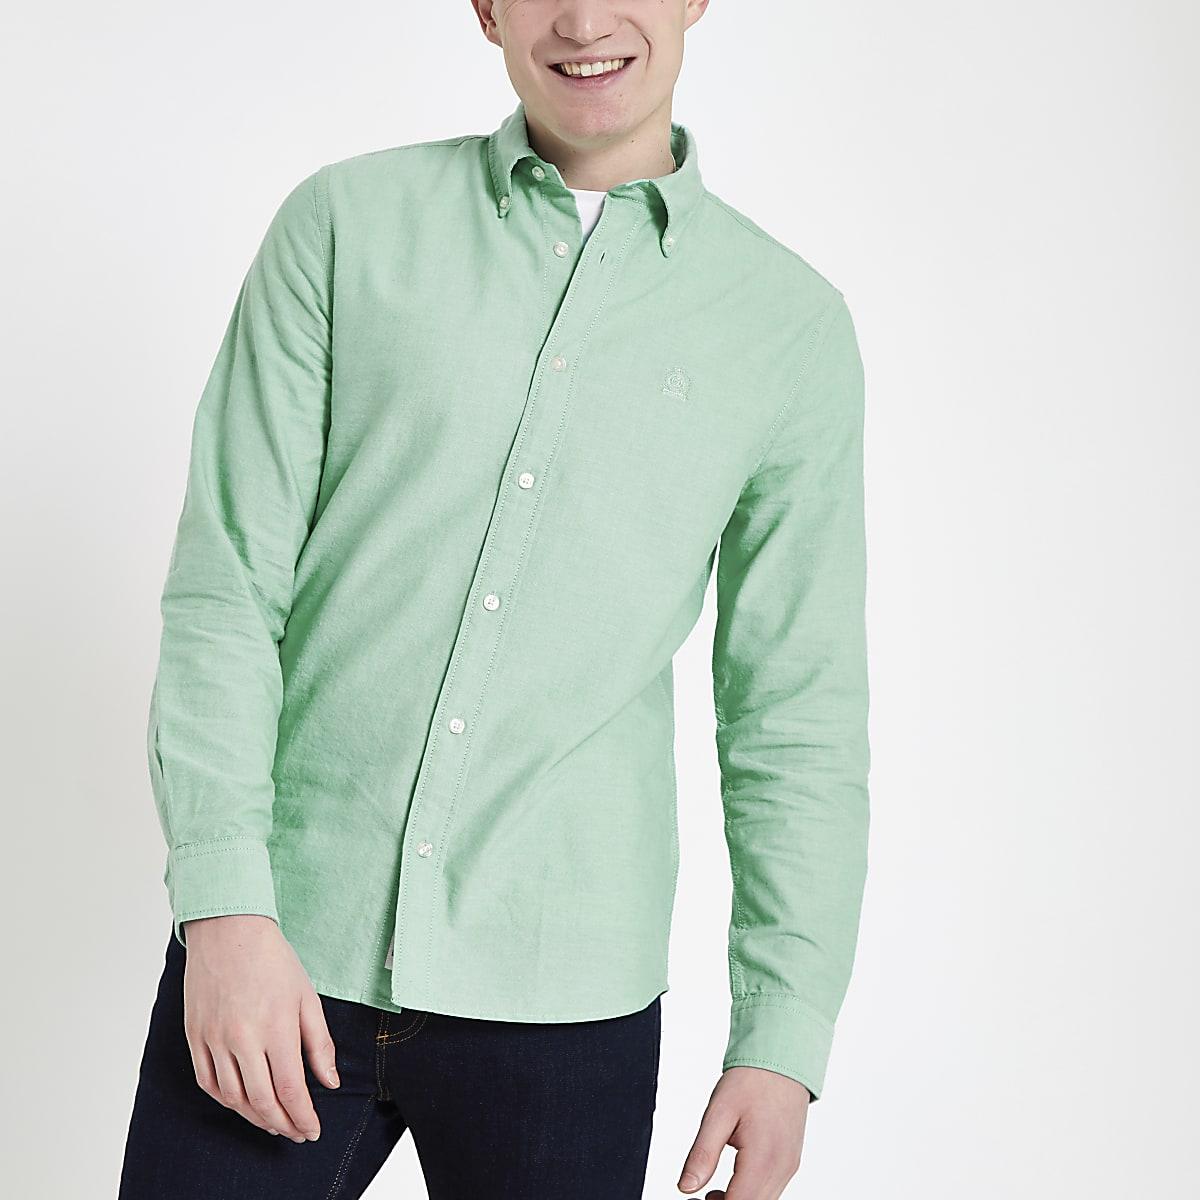 Mintgroen Heren Overhemd.Mintgroen Oxford Overhemd Met Lange Mouwen Overhemden Met Lange